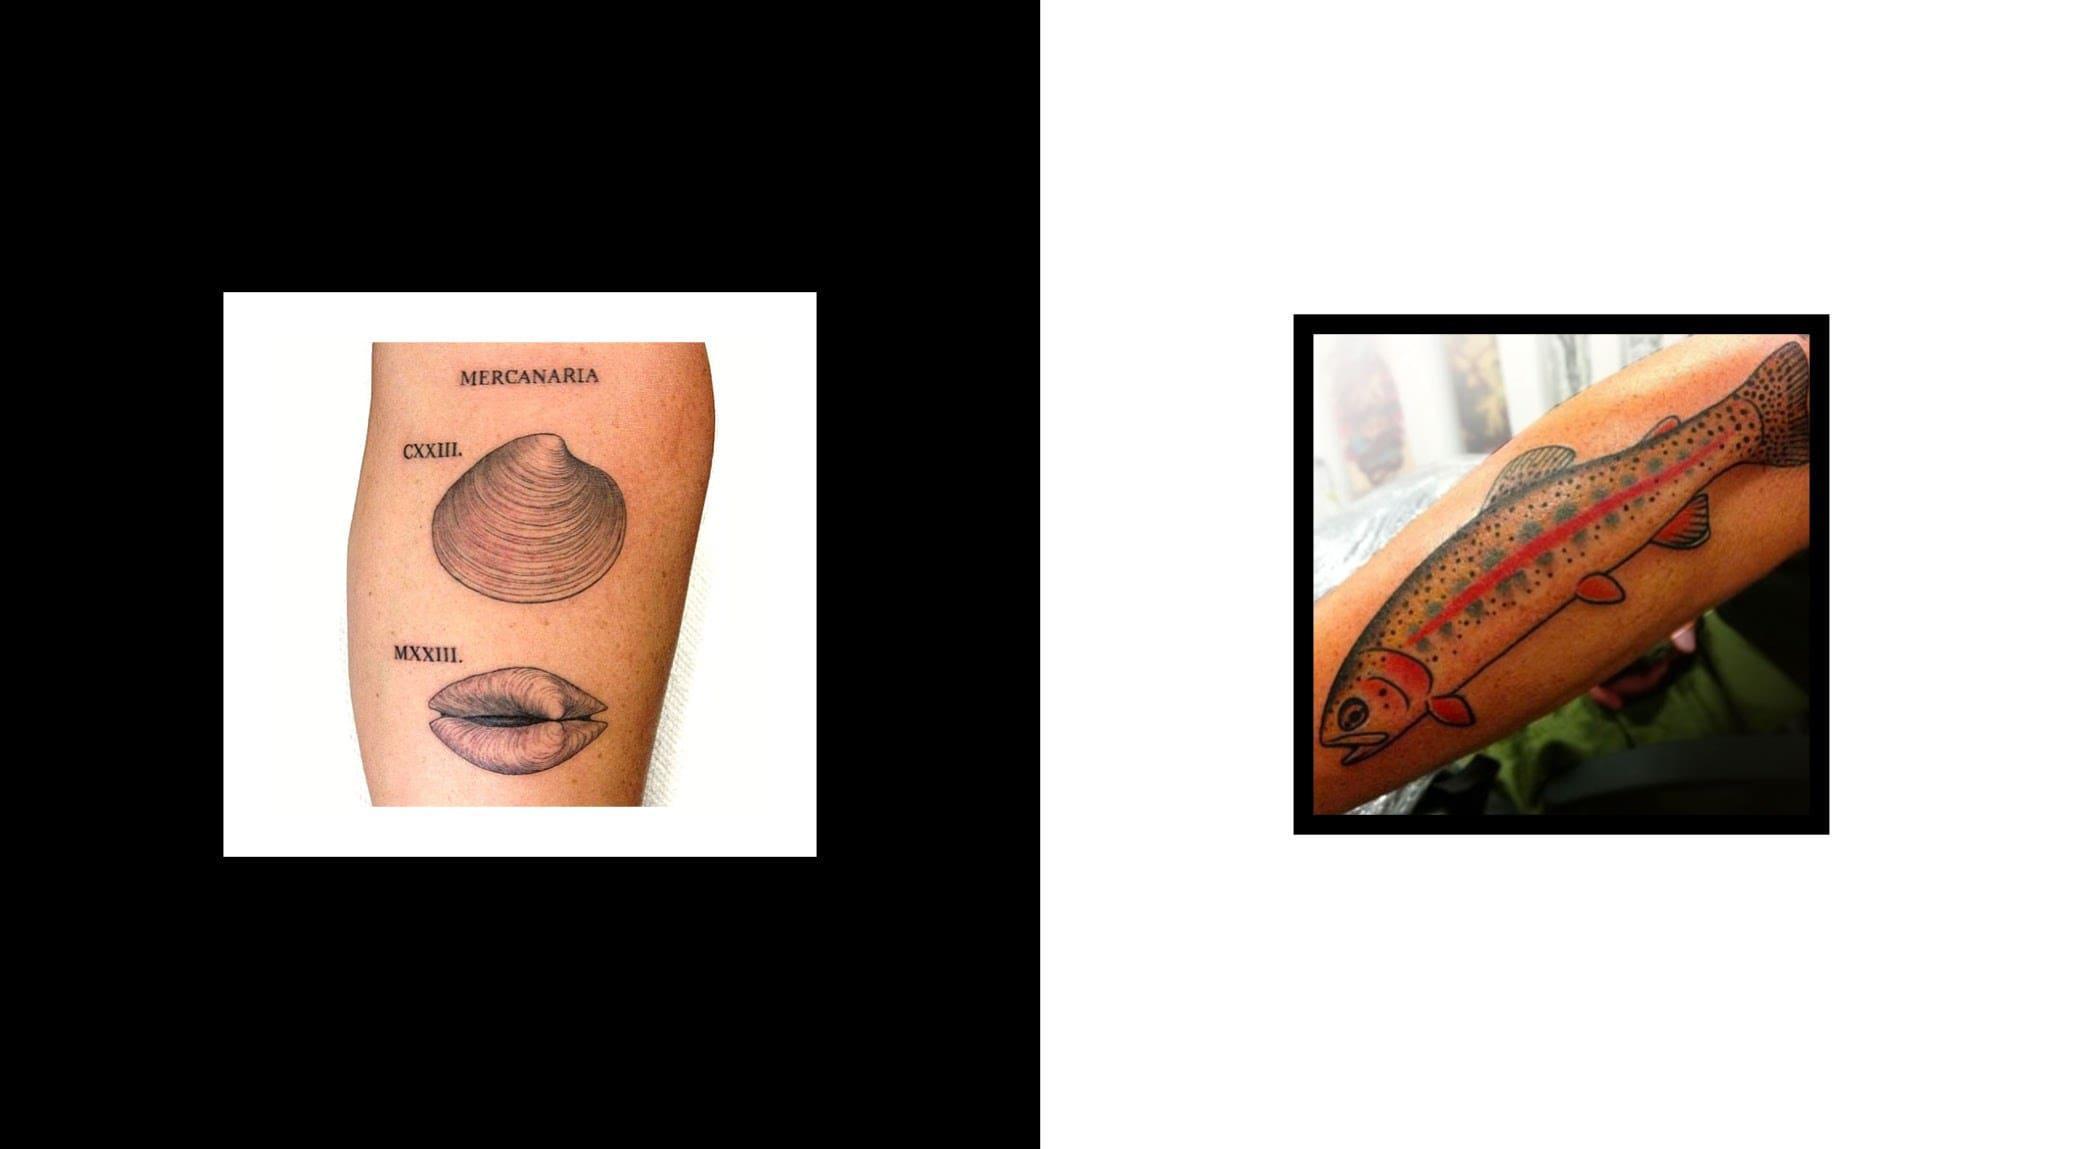 original_006-tattoo-finedininglovers6.jpg